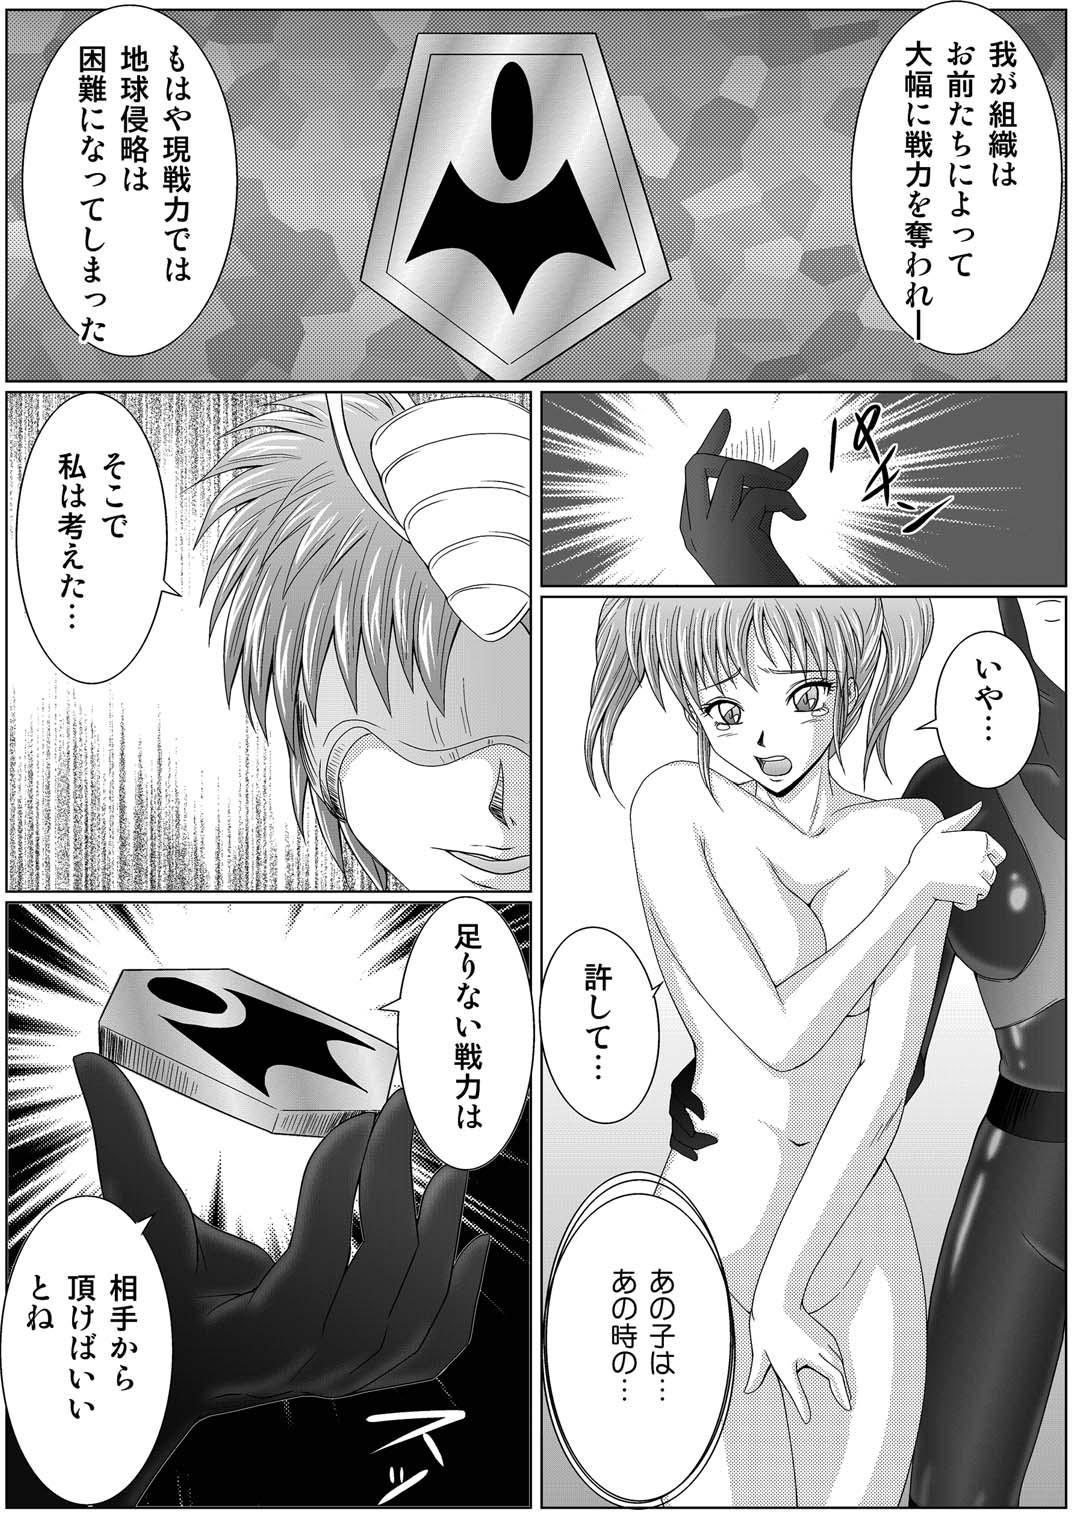 [Macxe's (monmon)] Tokubousentai Dinaranger ~Heroine Kairaku Sennou Keikaku~ Vol.01/02/03 (Renkaban) [Digital] 19